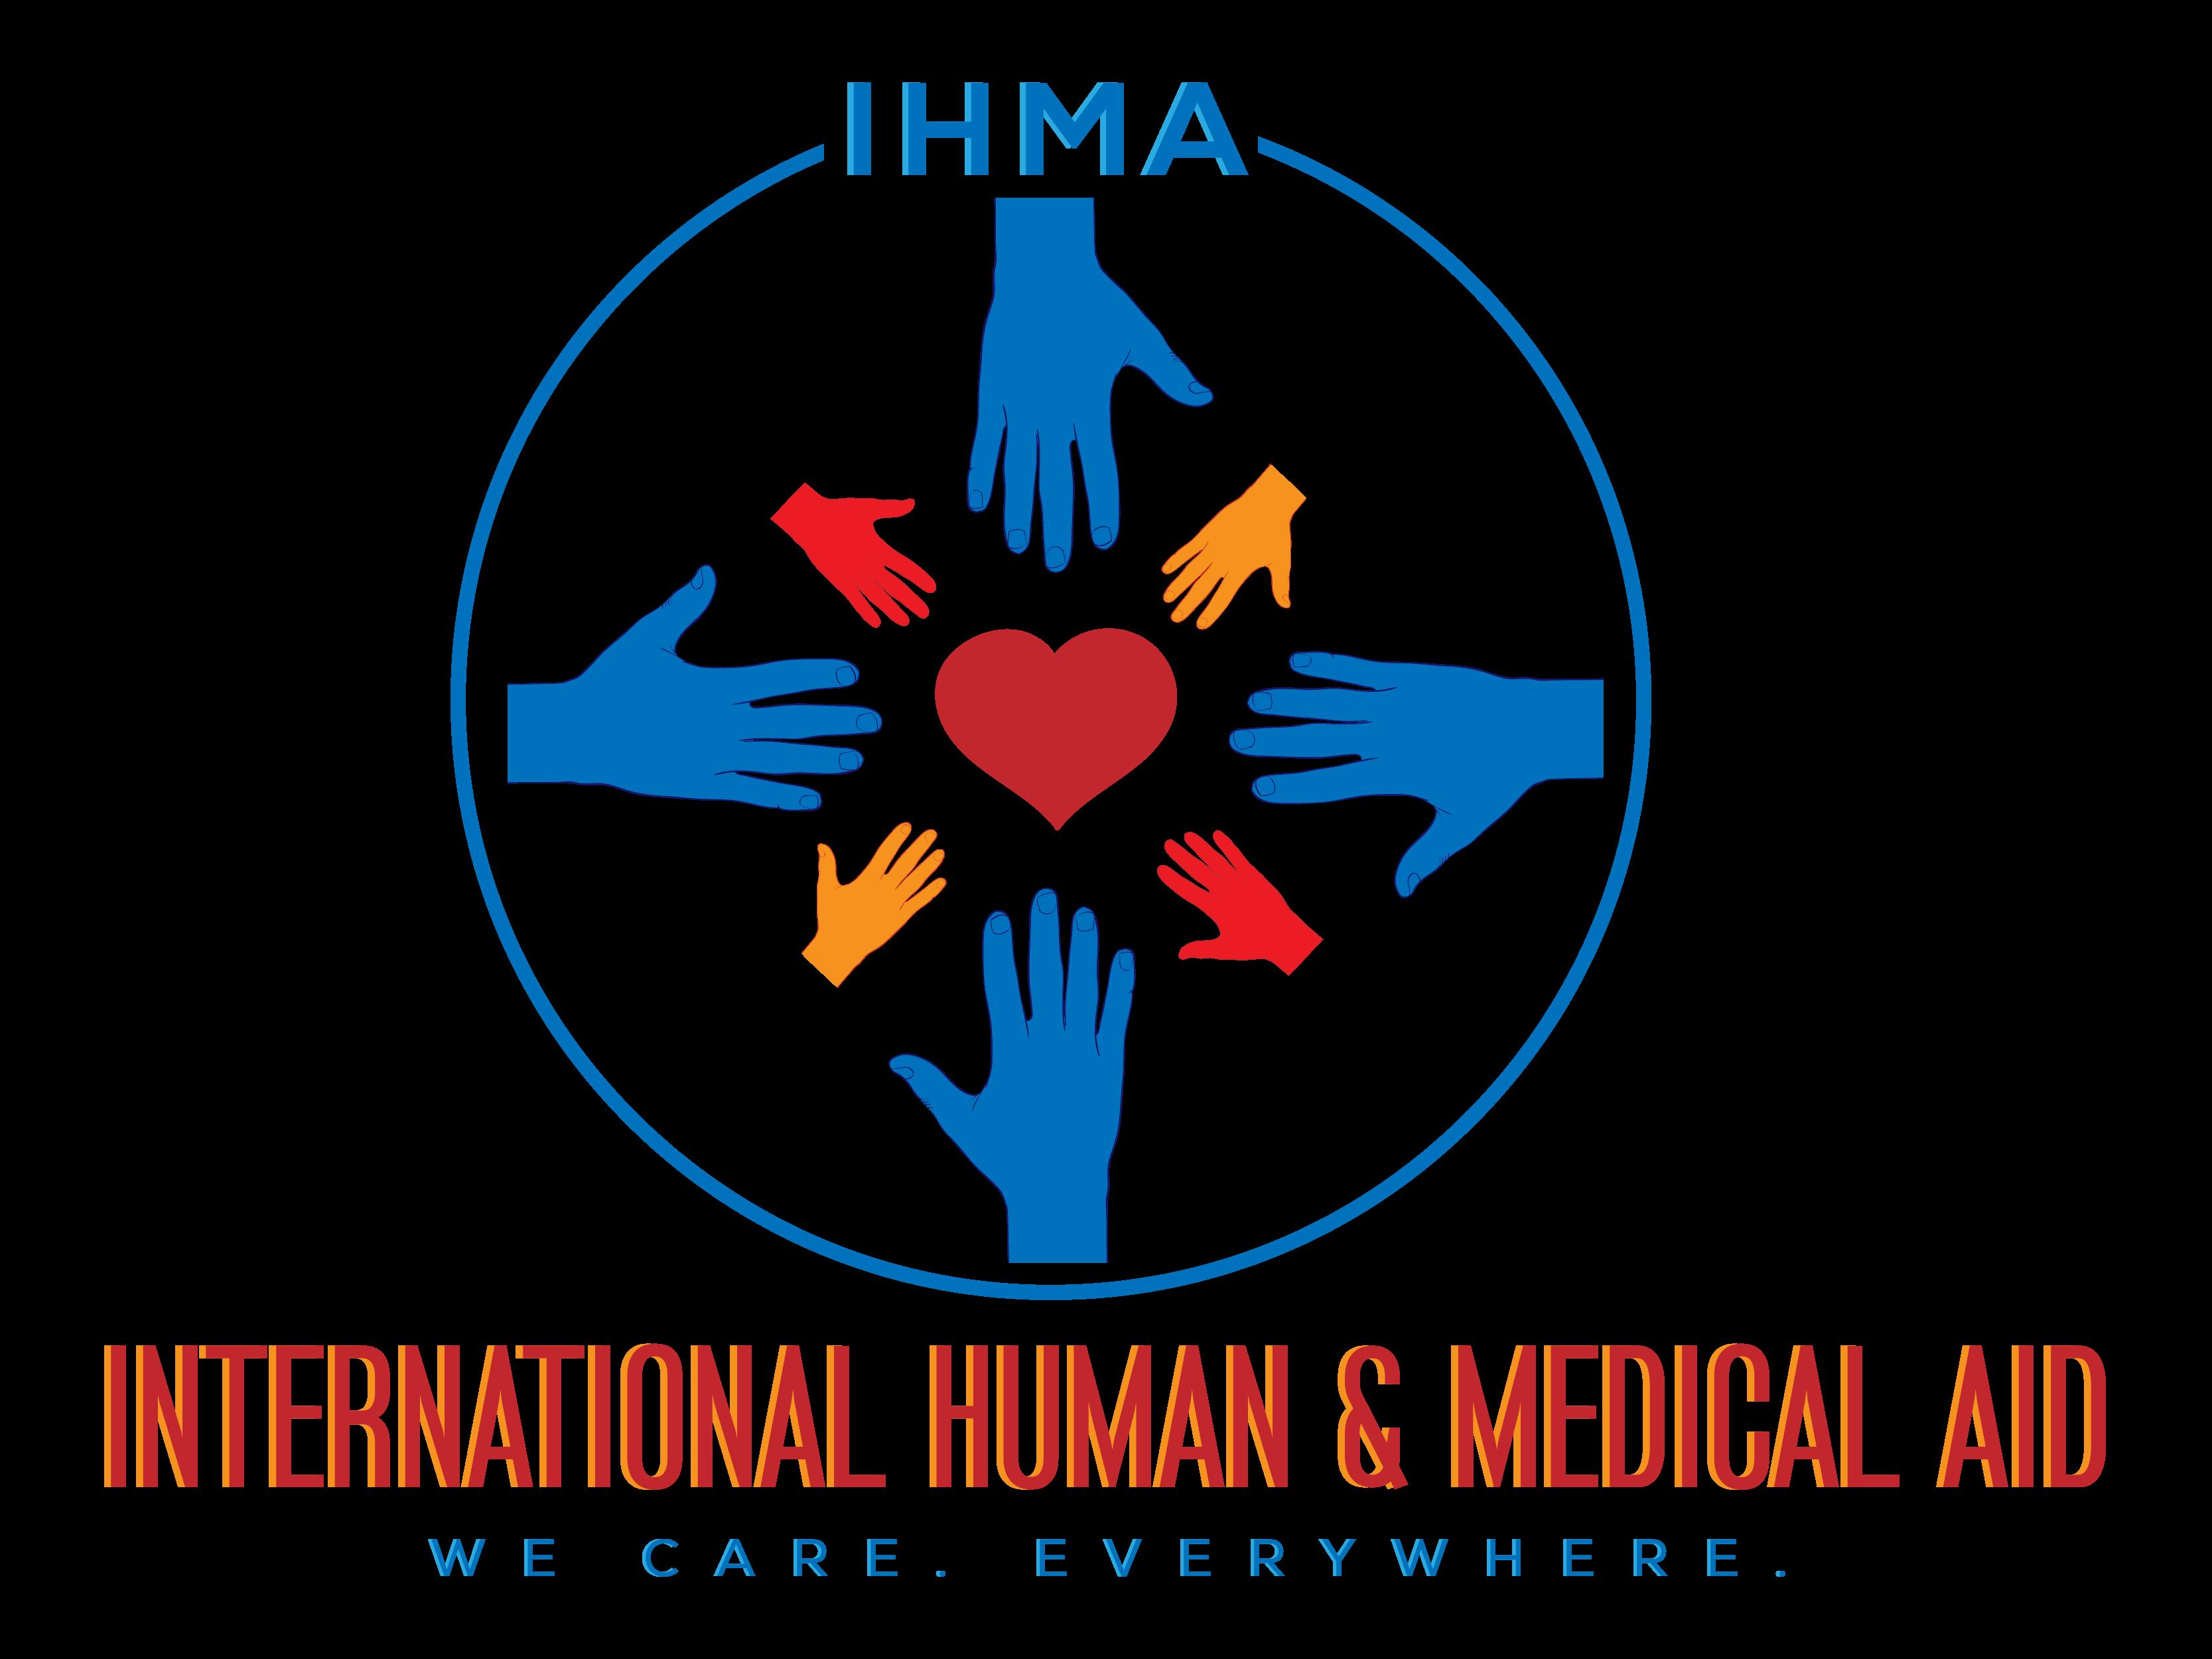 INTERNATIONAL HUMAN & MEDICAL AID